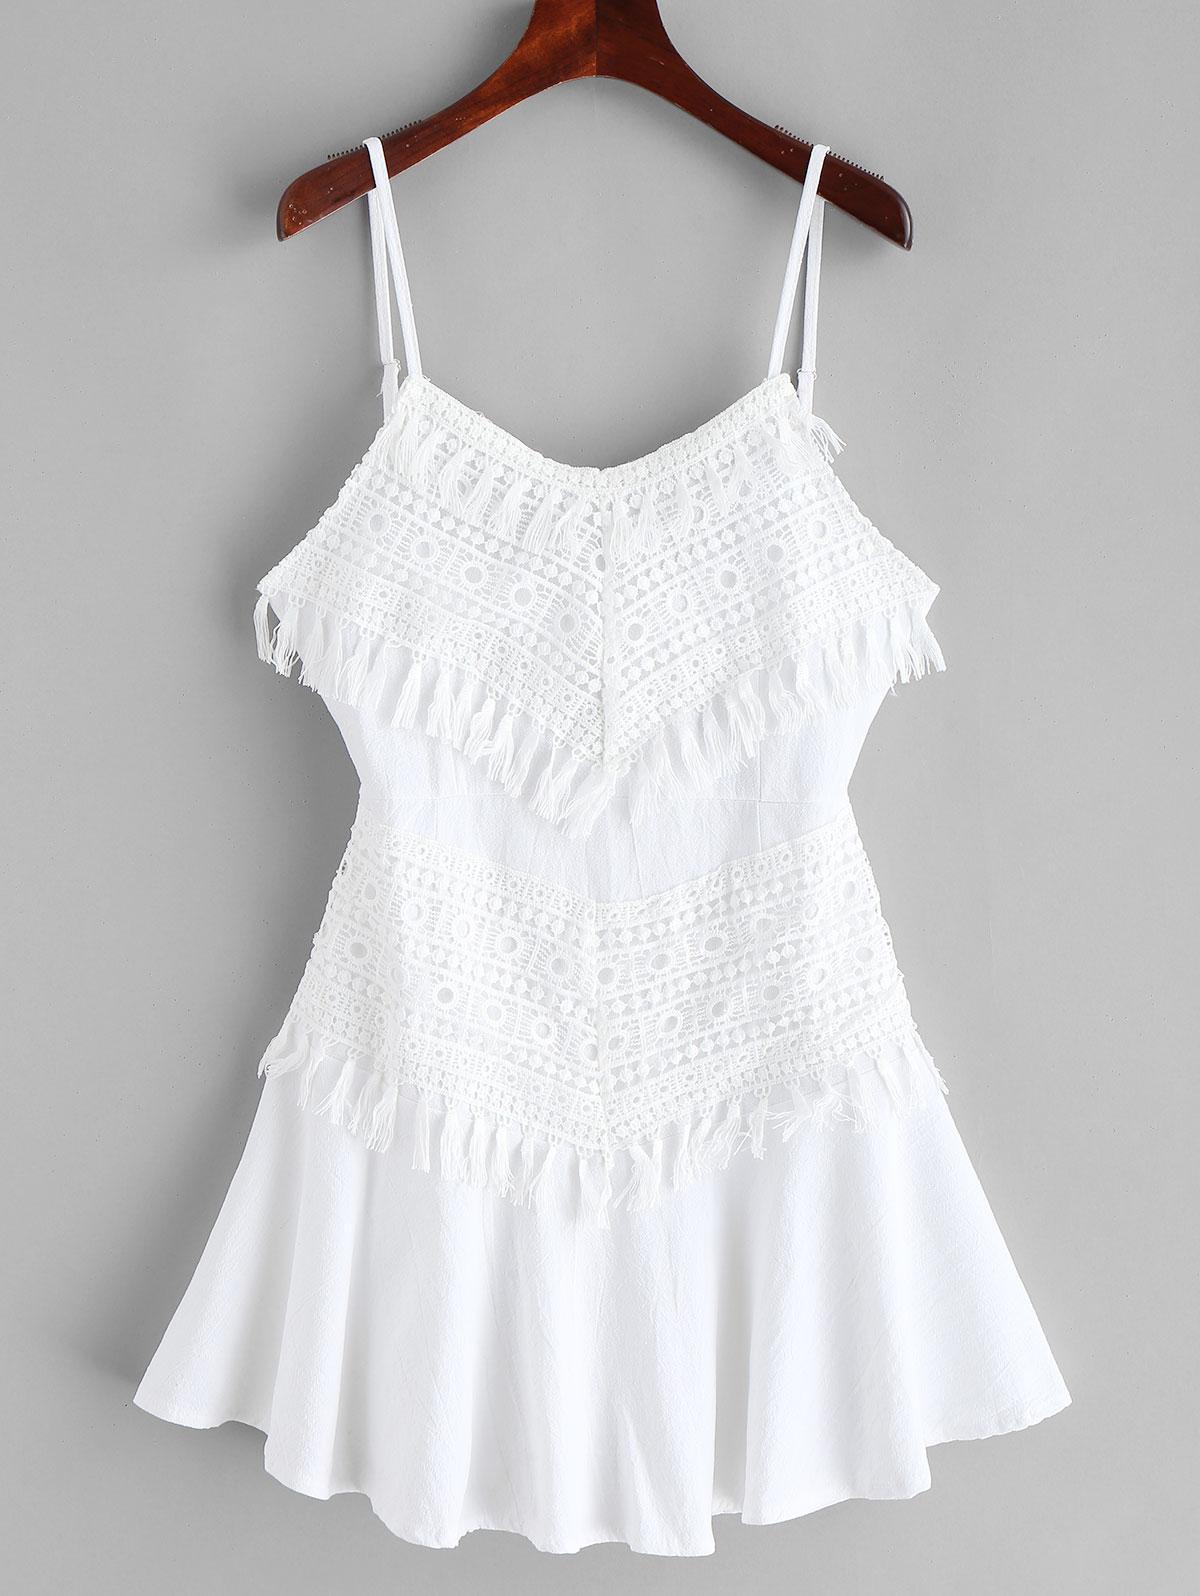 Crochet Panel Tassels A Line Cami Dress, White